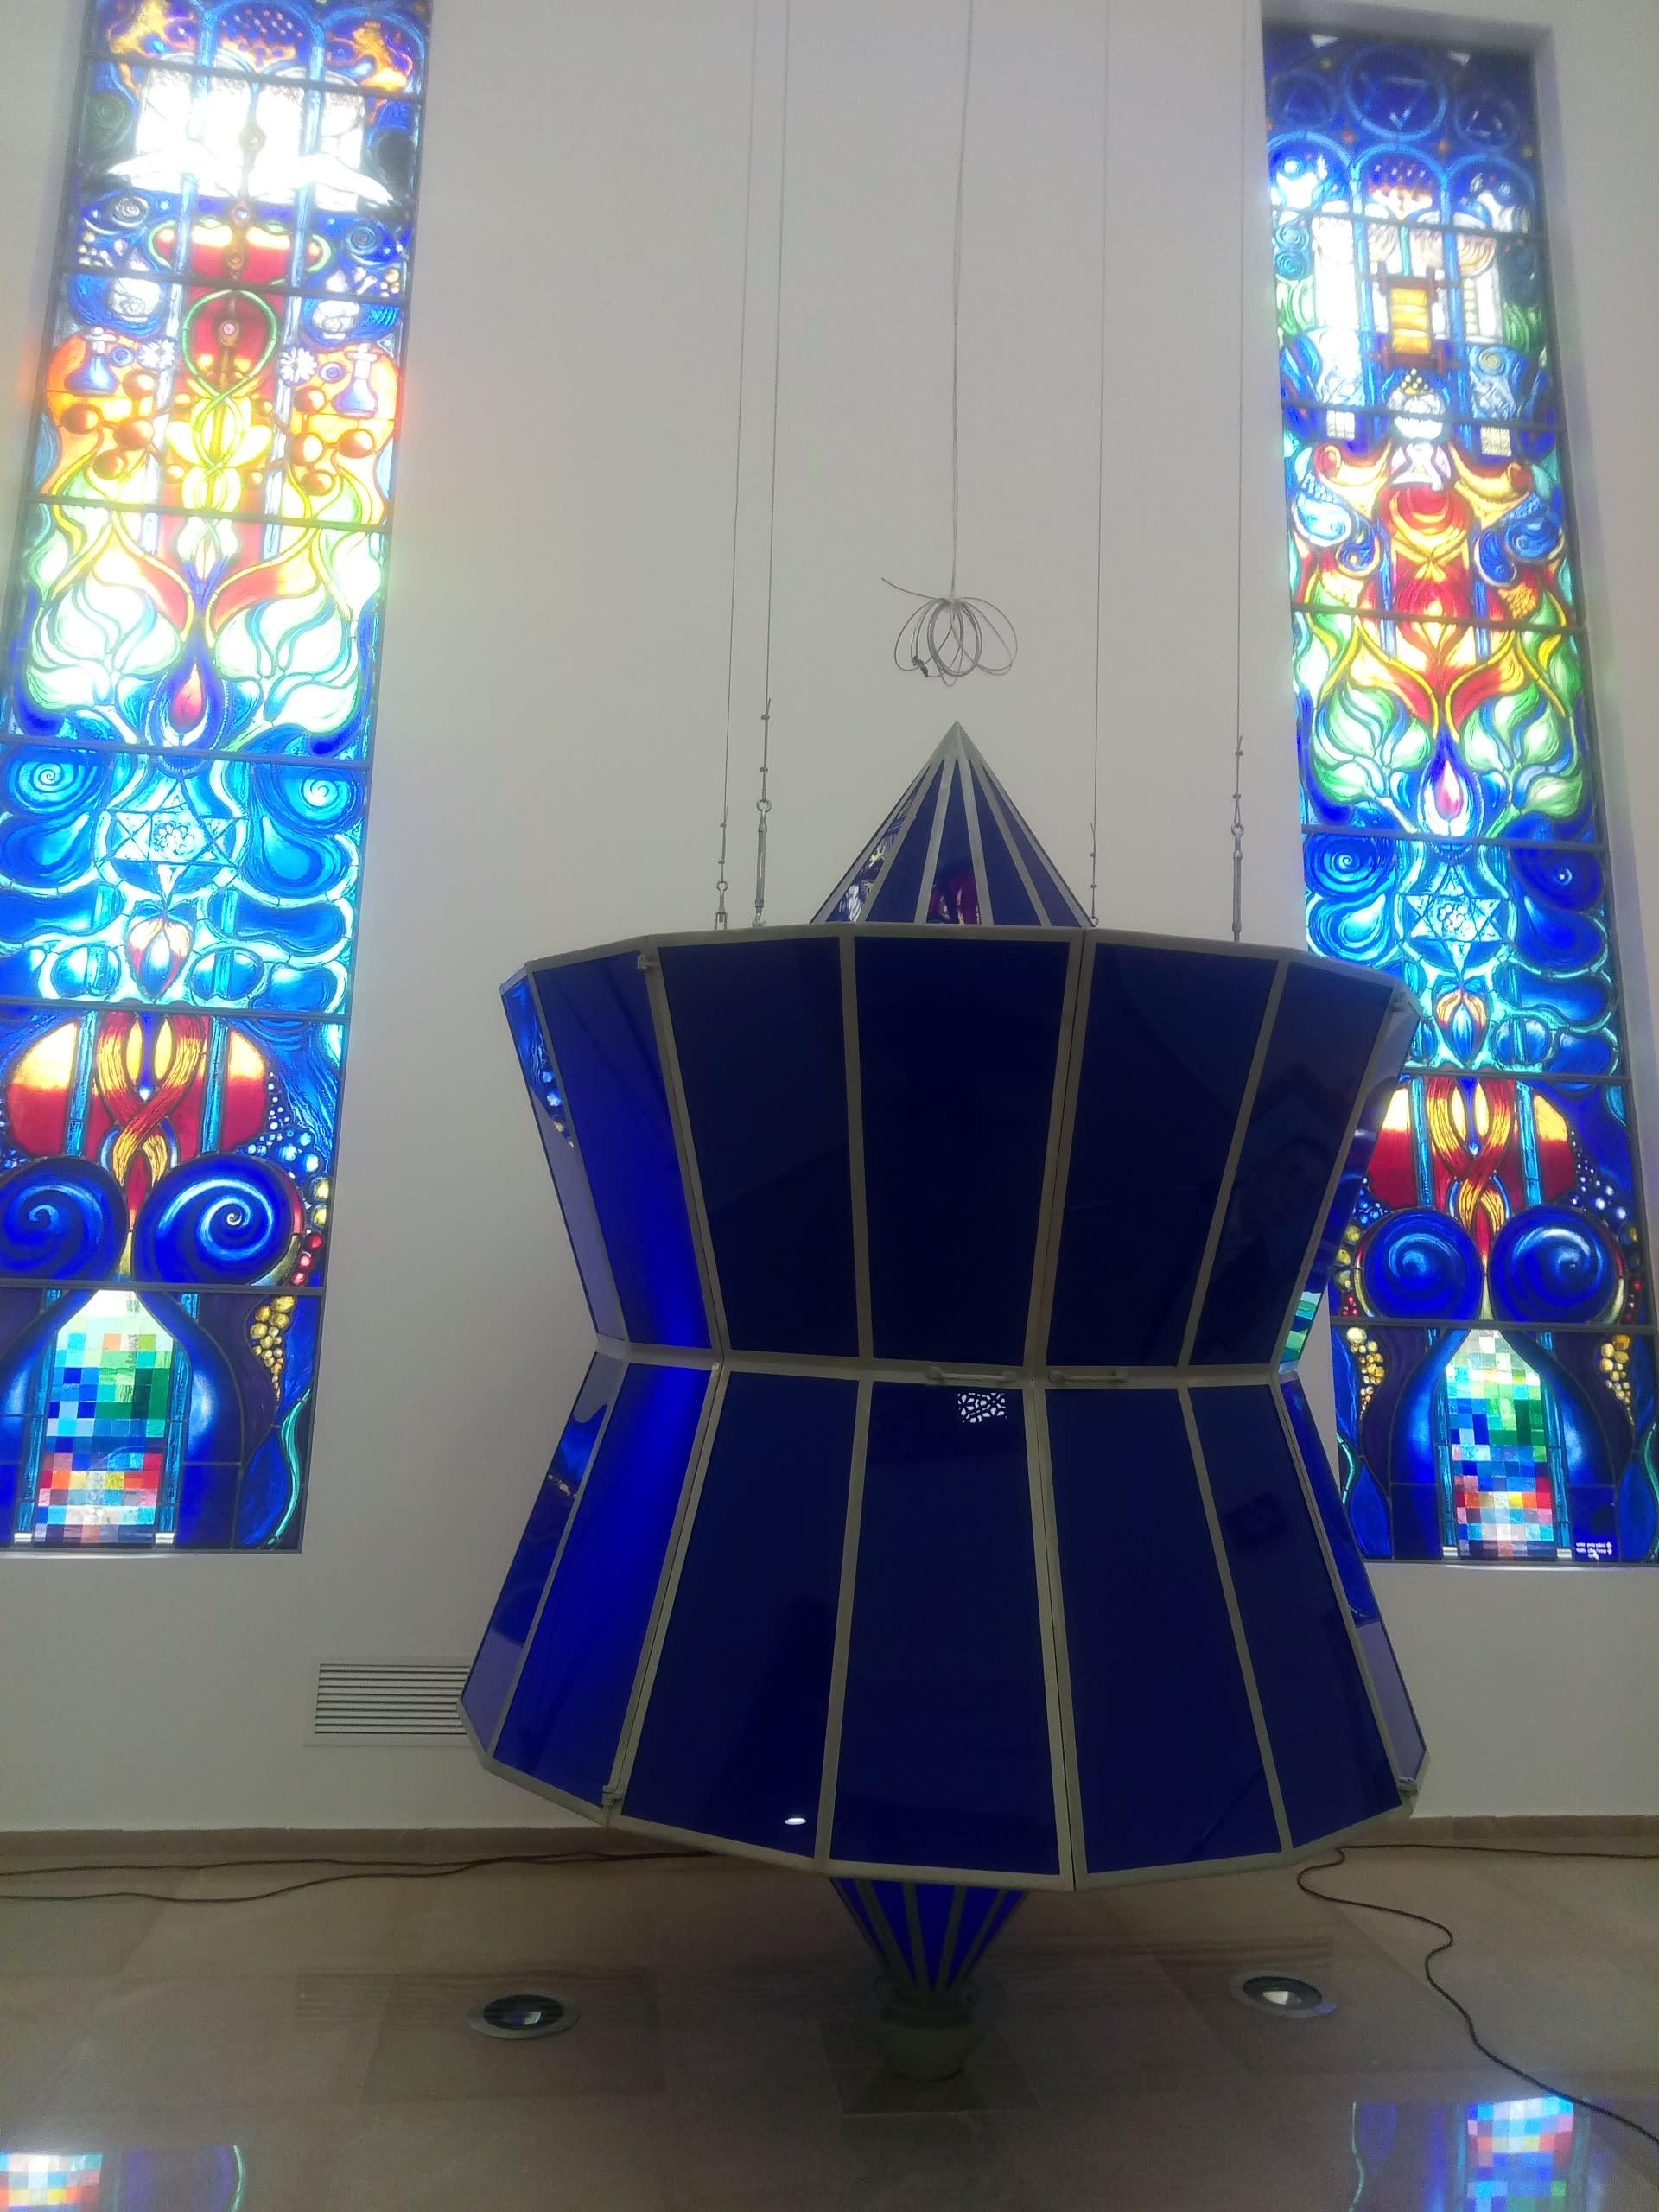 Inside the new synagogue at Sheba Medical Center (COURTESY).